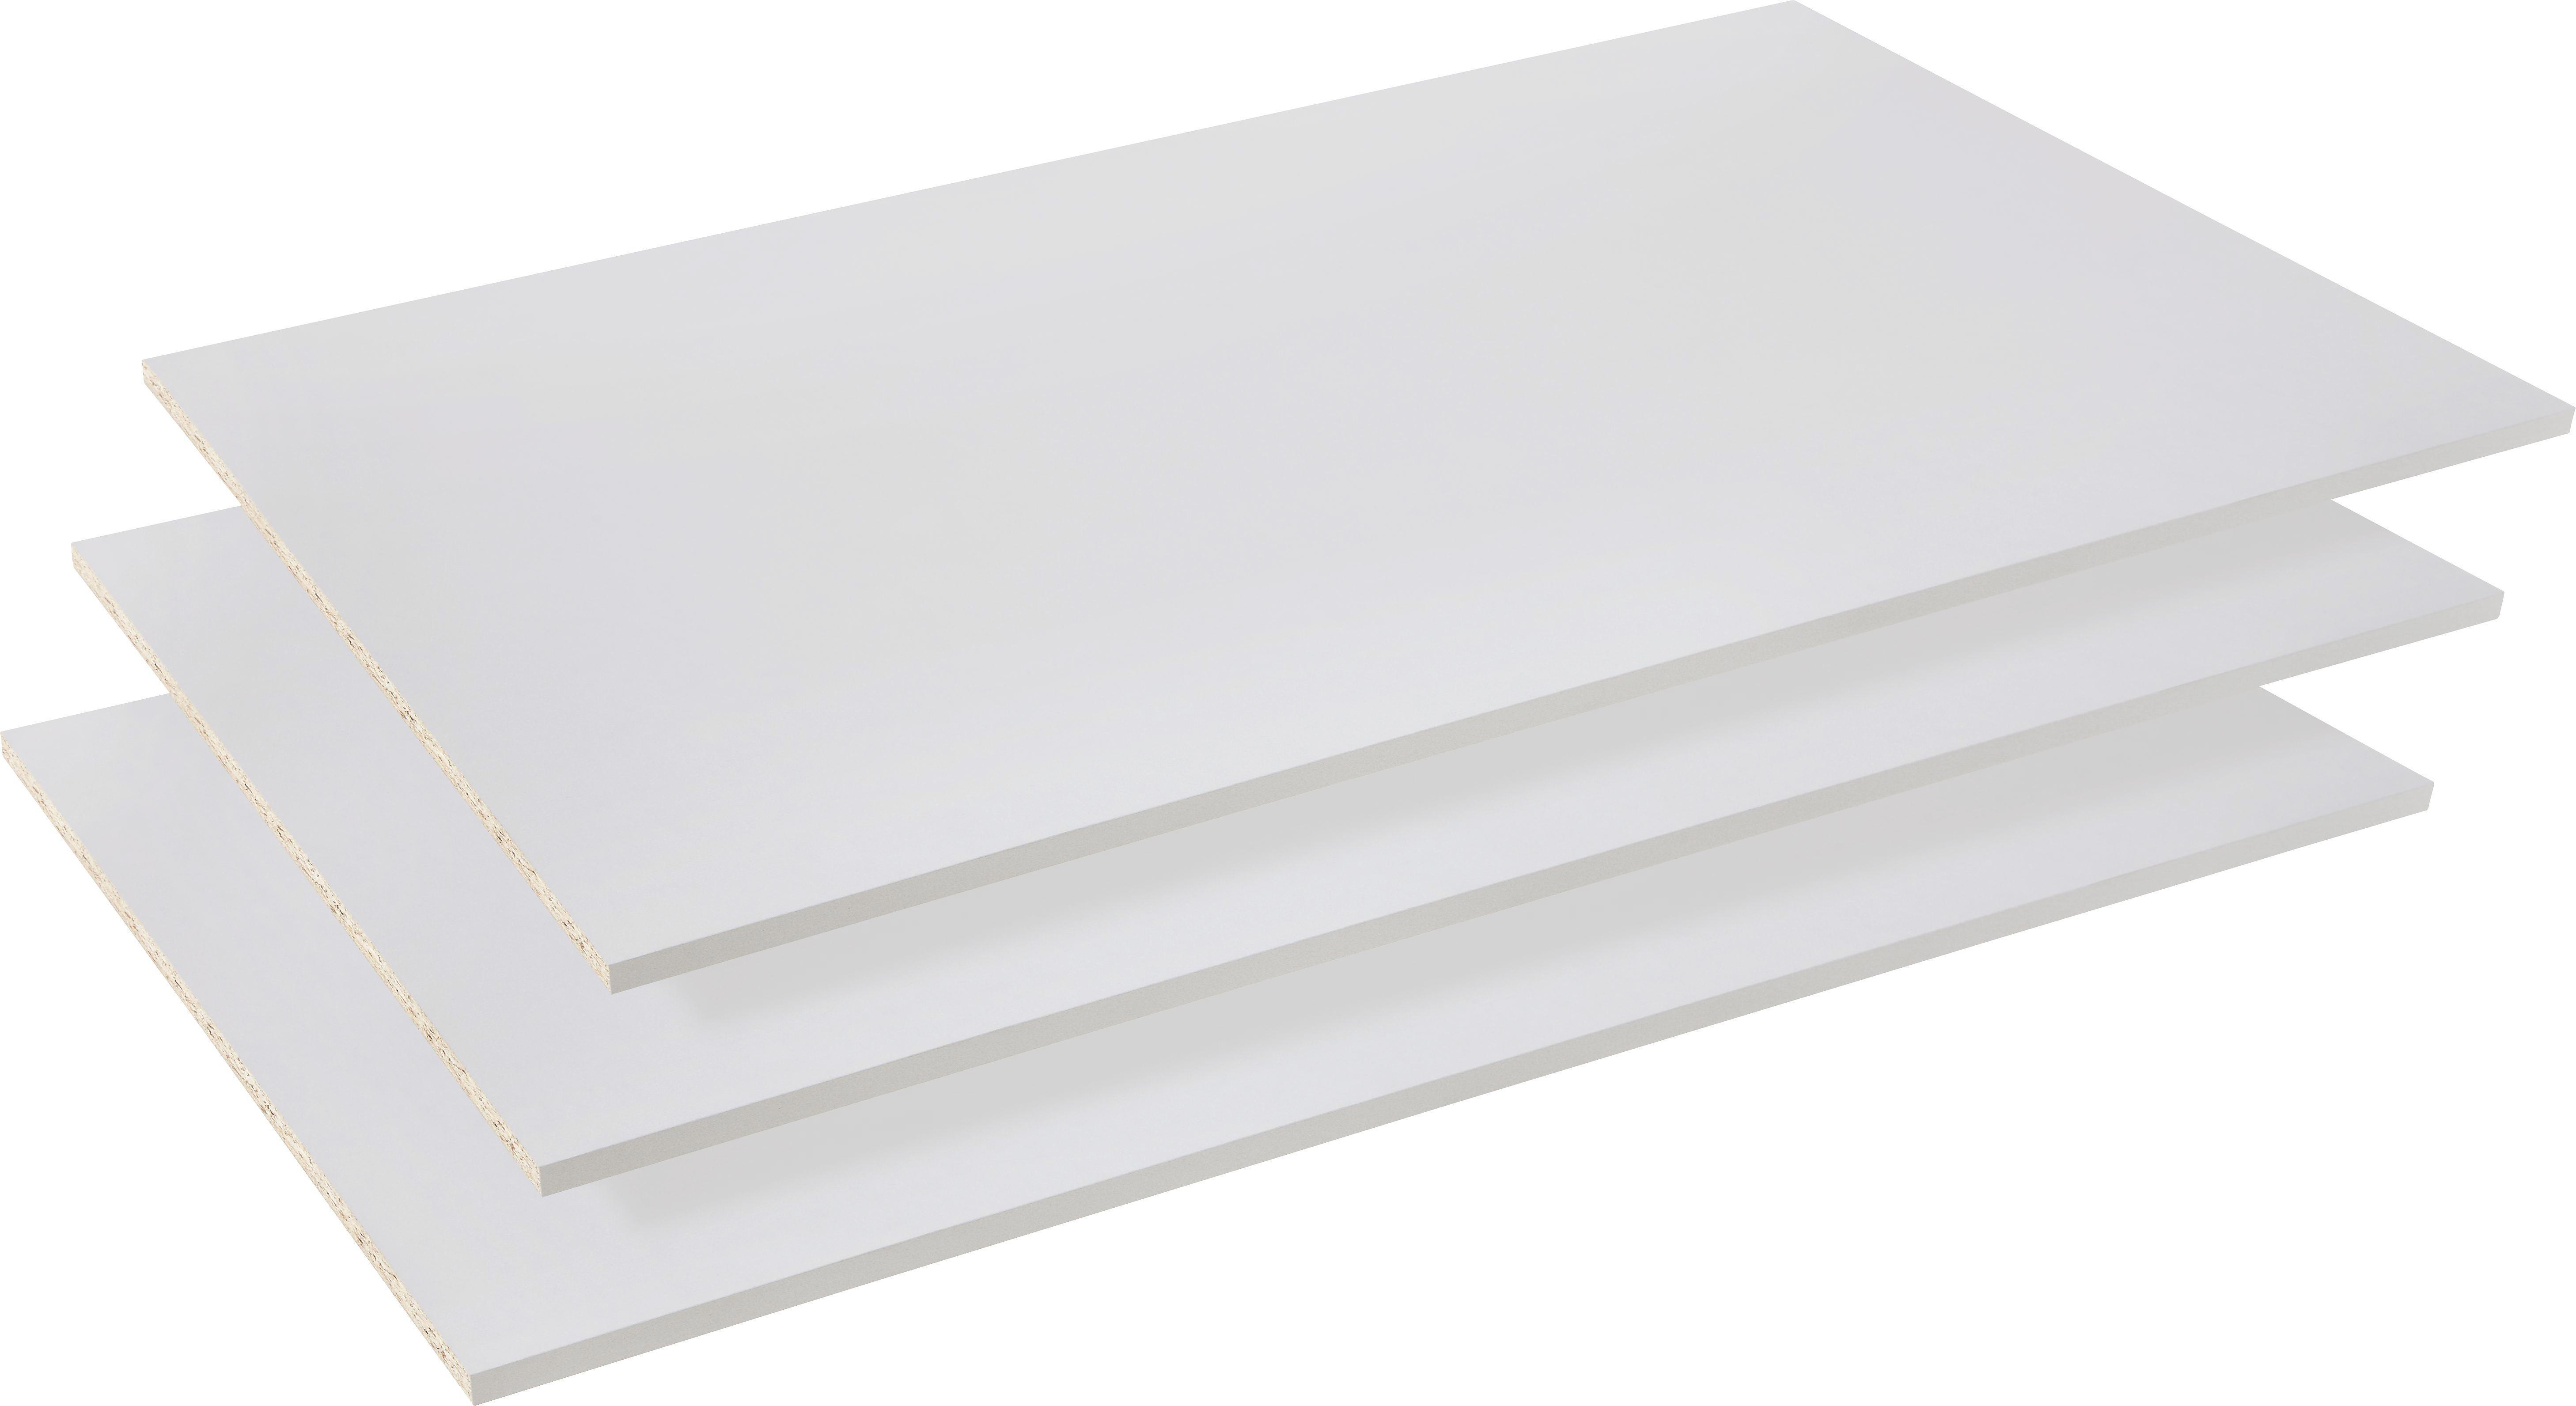 Einlegeboden in Grau aus Holz/metall - Grau, Holz/Metall (83/42/1,5cm)